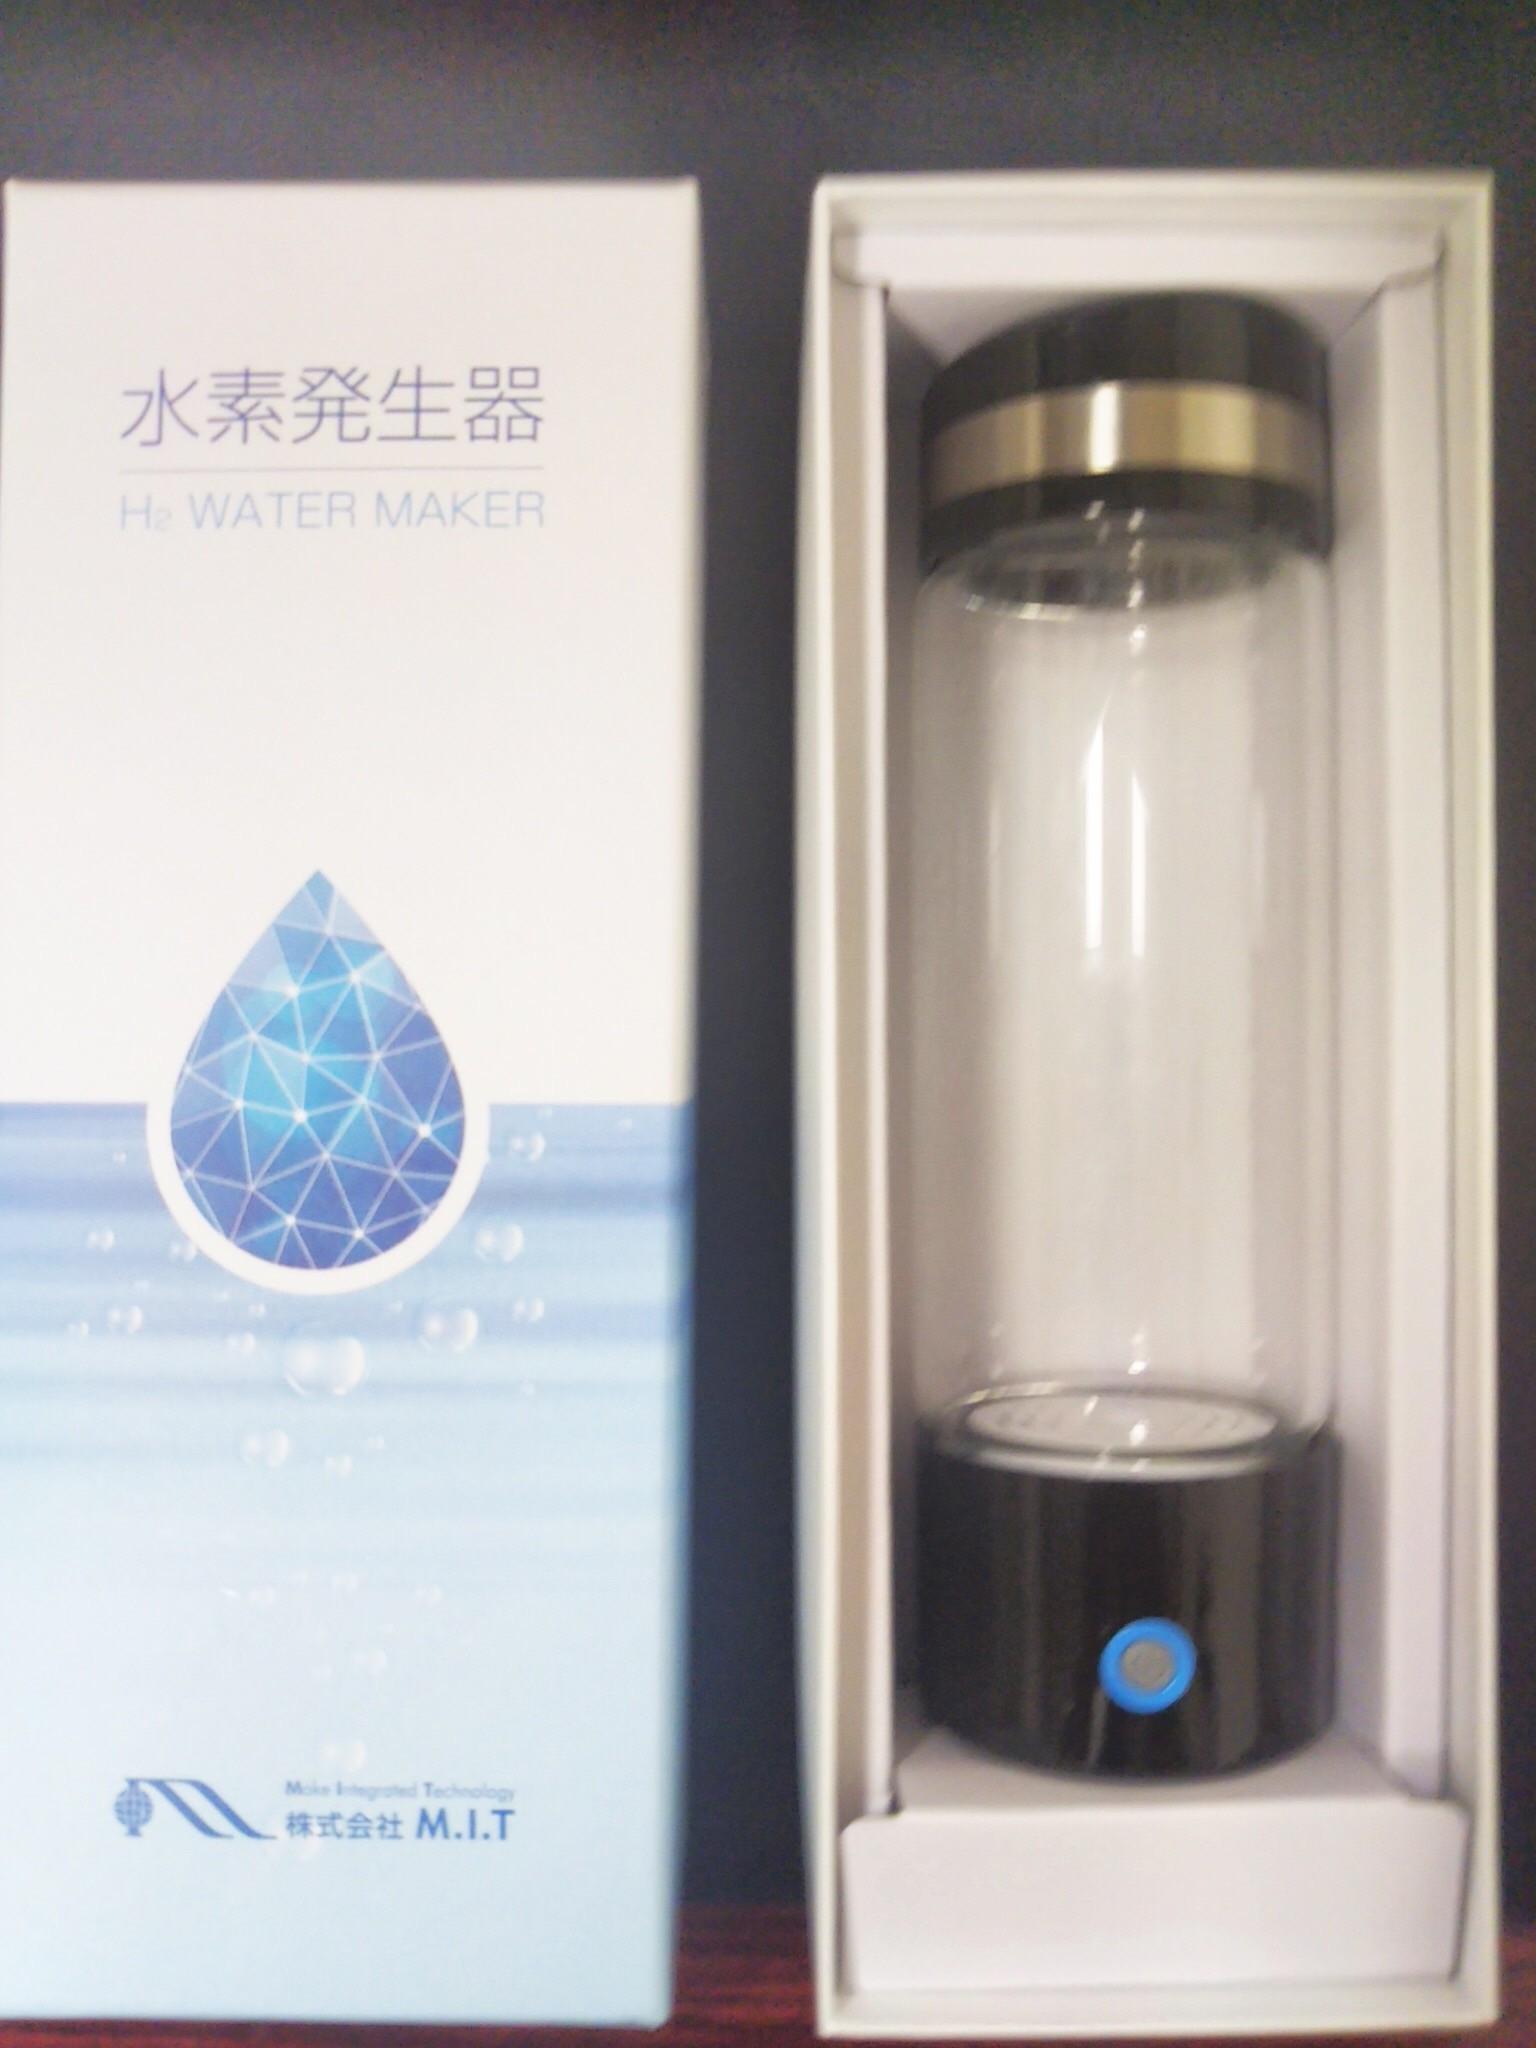 水素発生器 H2 WATER MAKER